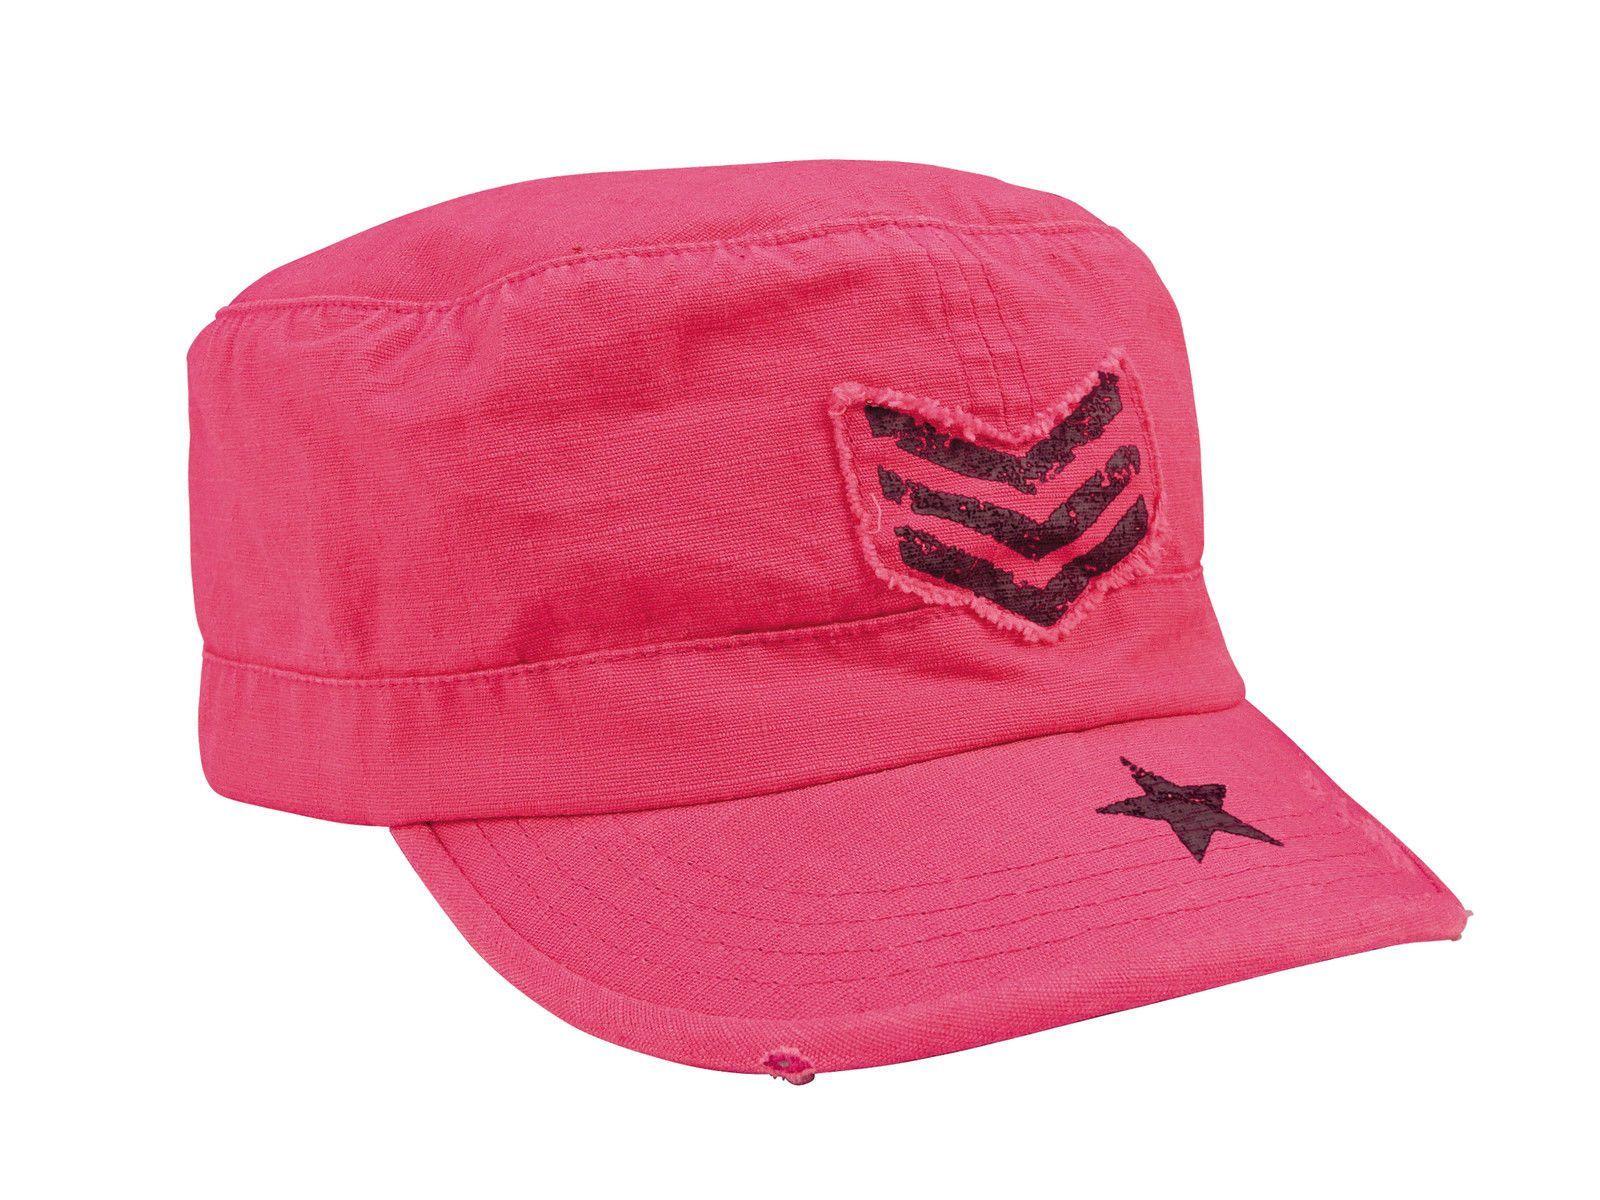 9004c81982b 1159   1149 Rothco Women S Vintage Stripes   Stars Adjustable Fatigues Cap